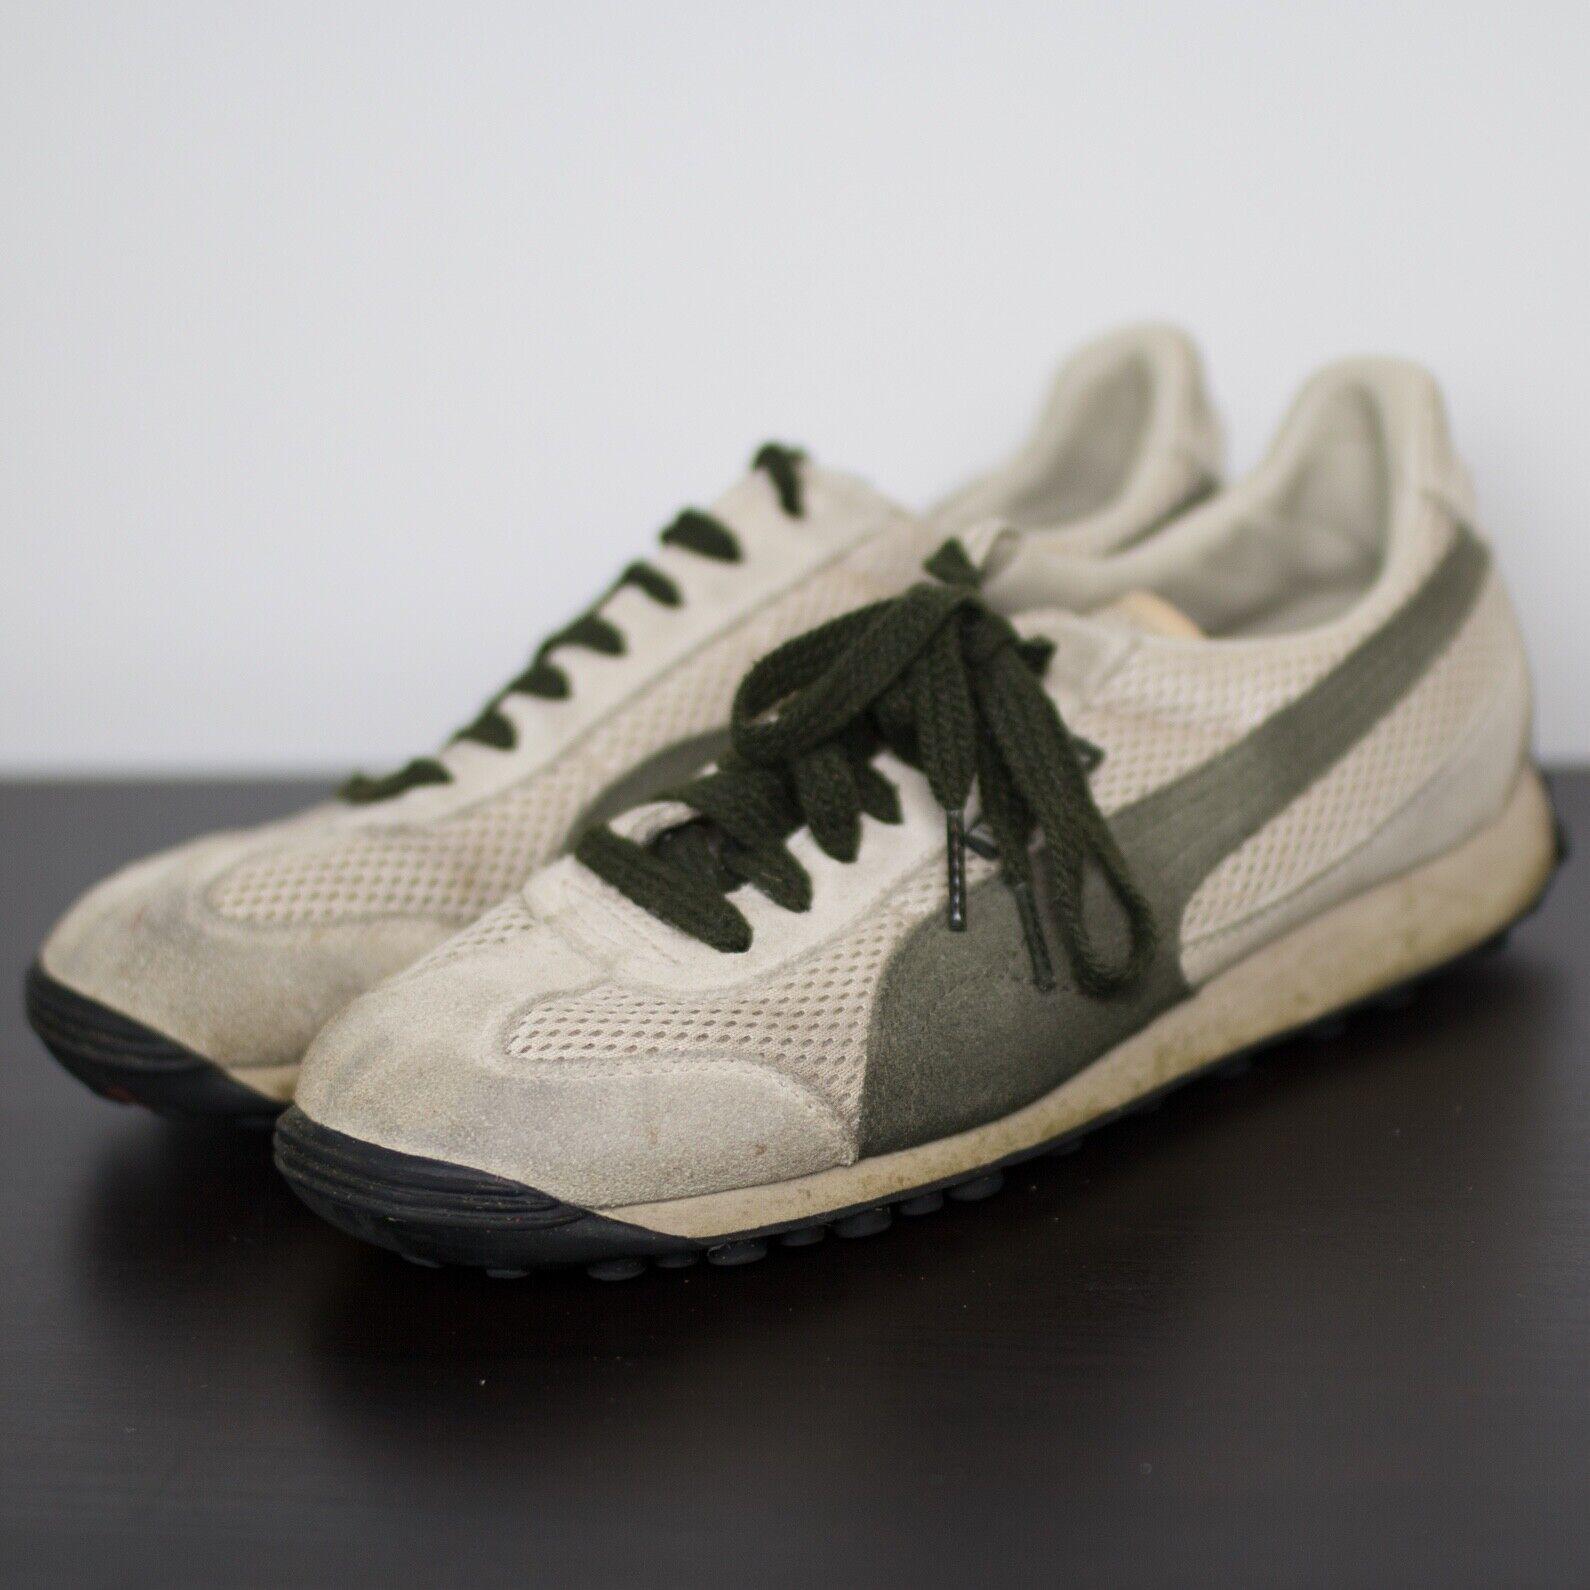 Vintage Puma Tennis shoes Sneakers Waffle Cream Womens 7.5 Rare VTG